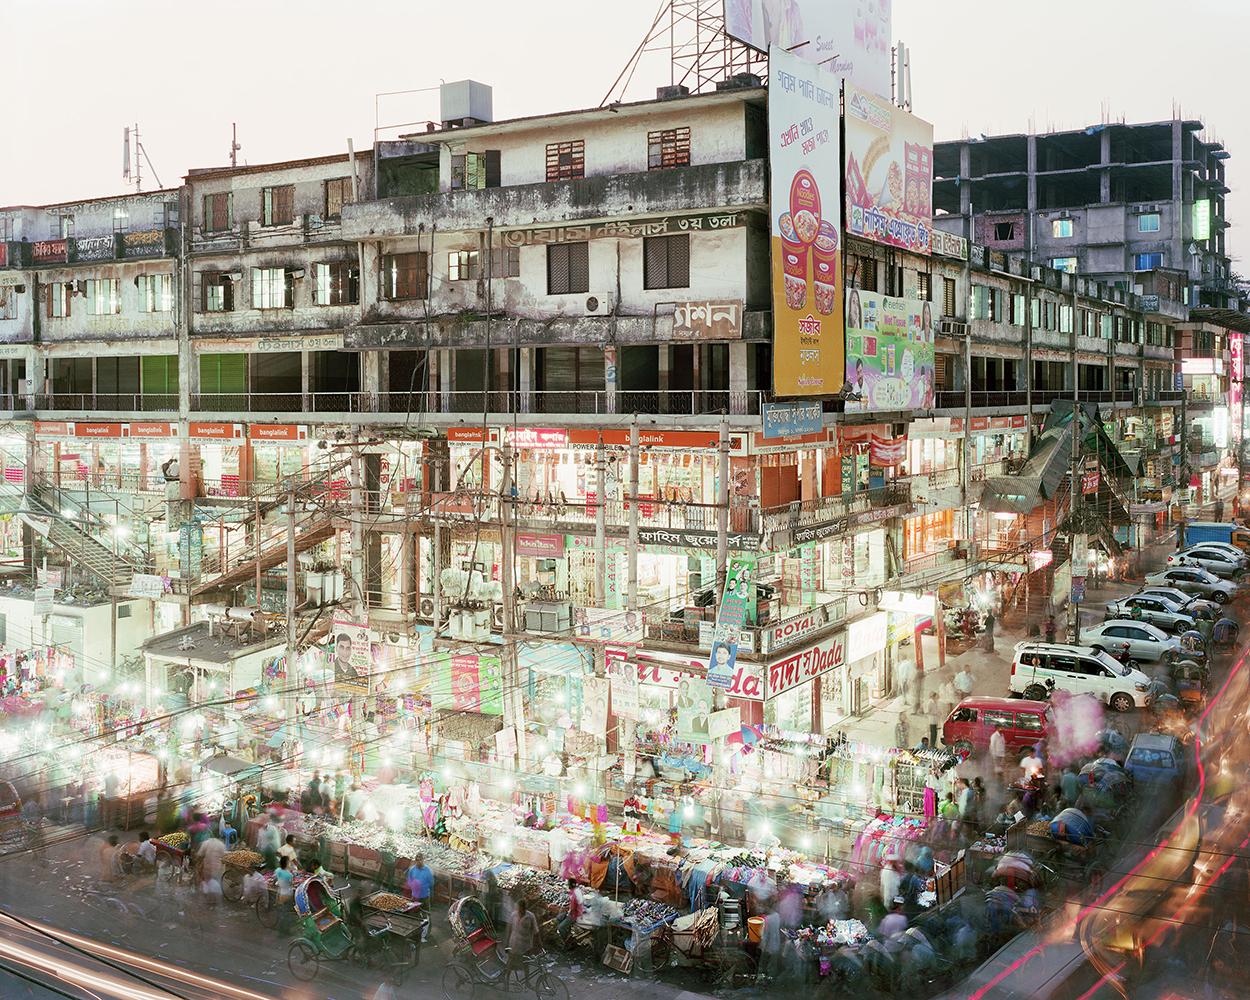 Noah Addis,  Mirpur One #1, Dhaka , 2013